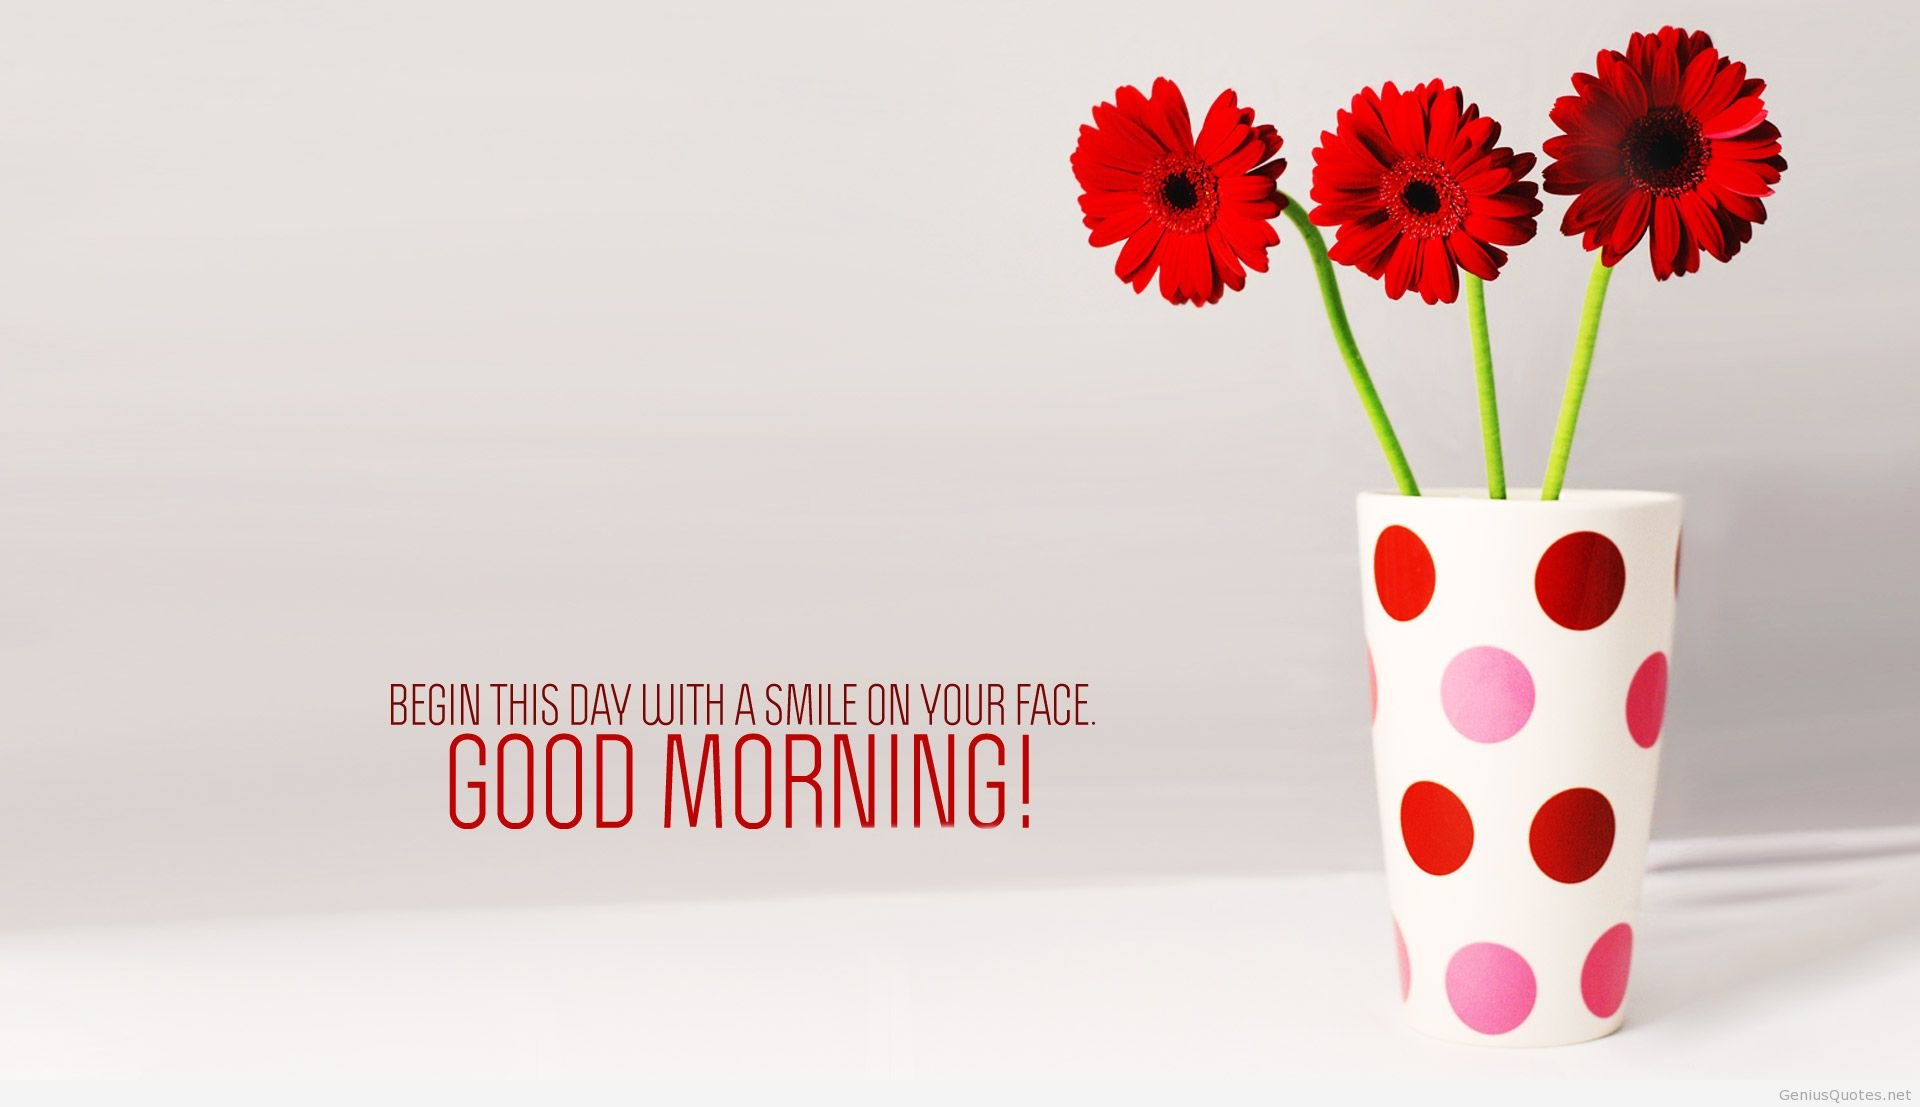 Good morning greetings motivational mood wallpaper 1920x1107 426316 wallpaperup - Happy mood wallpaper ...